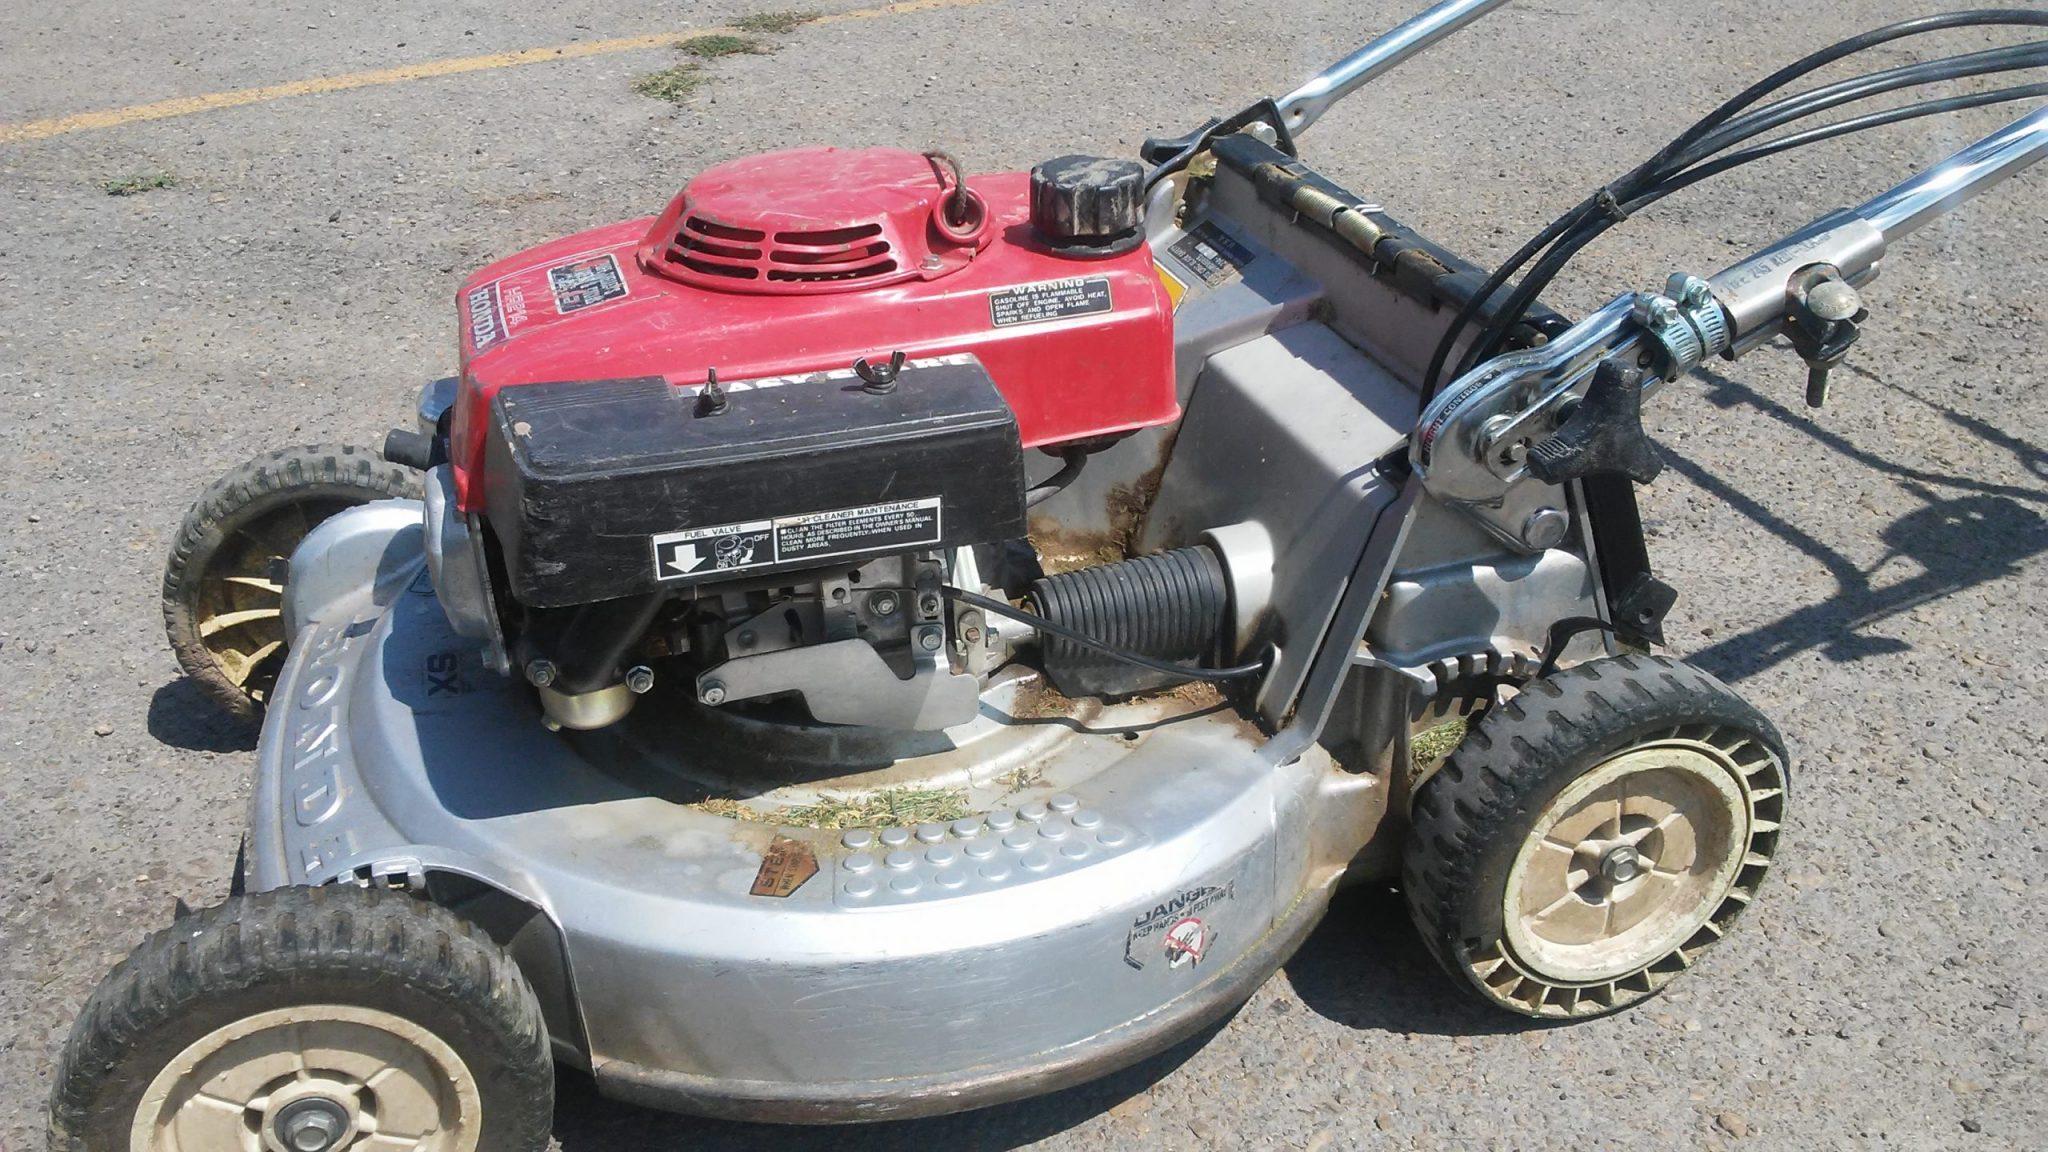 Replaces Honda Hr214 Gj Lawn Mower Carburetor Mower Parts Land